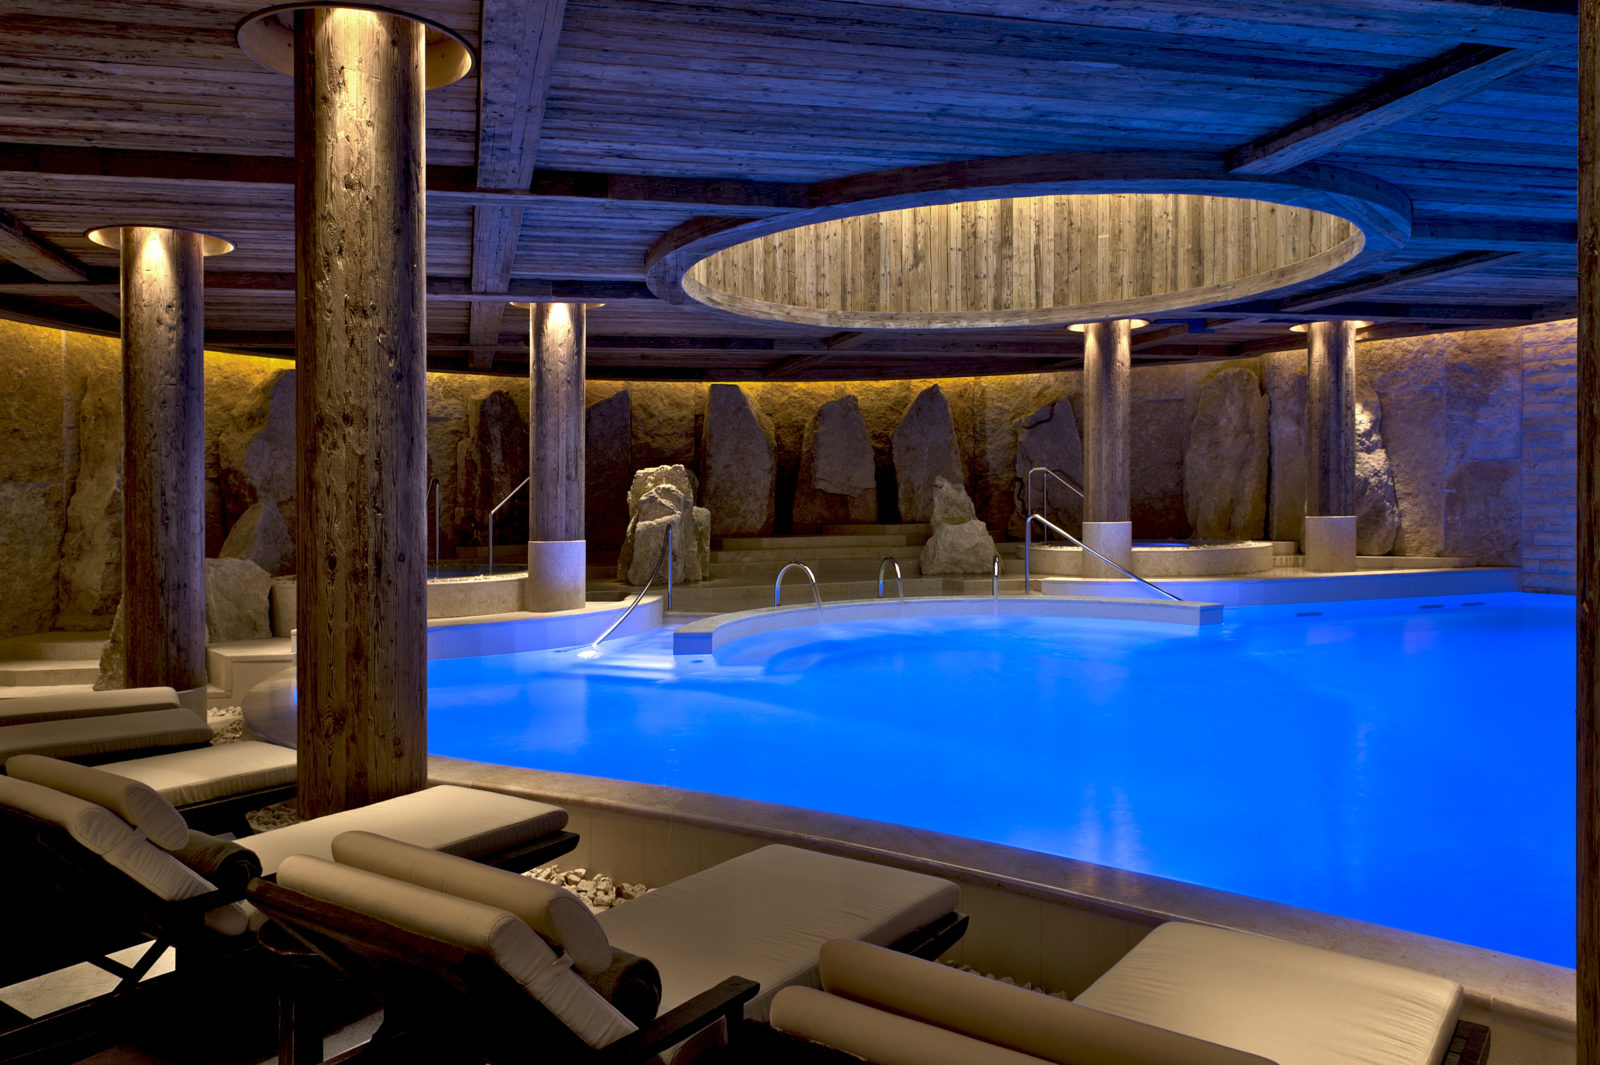 Hôtel Alpina Gstaad piscine Spa